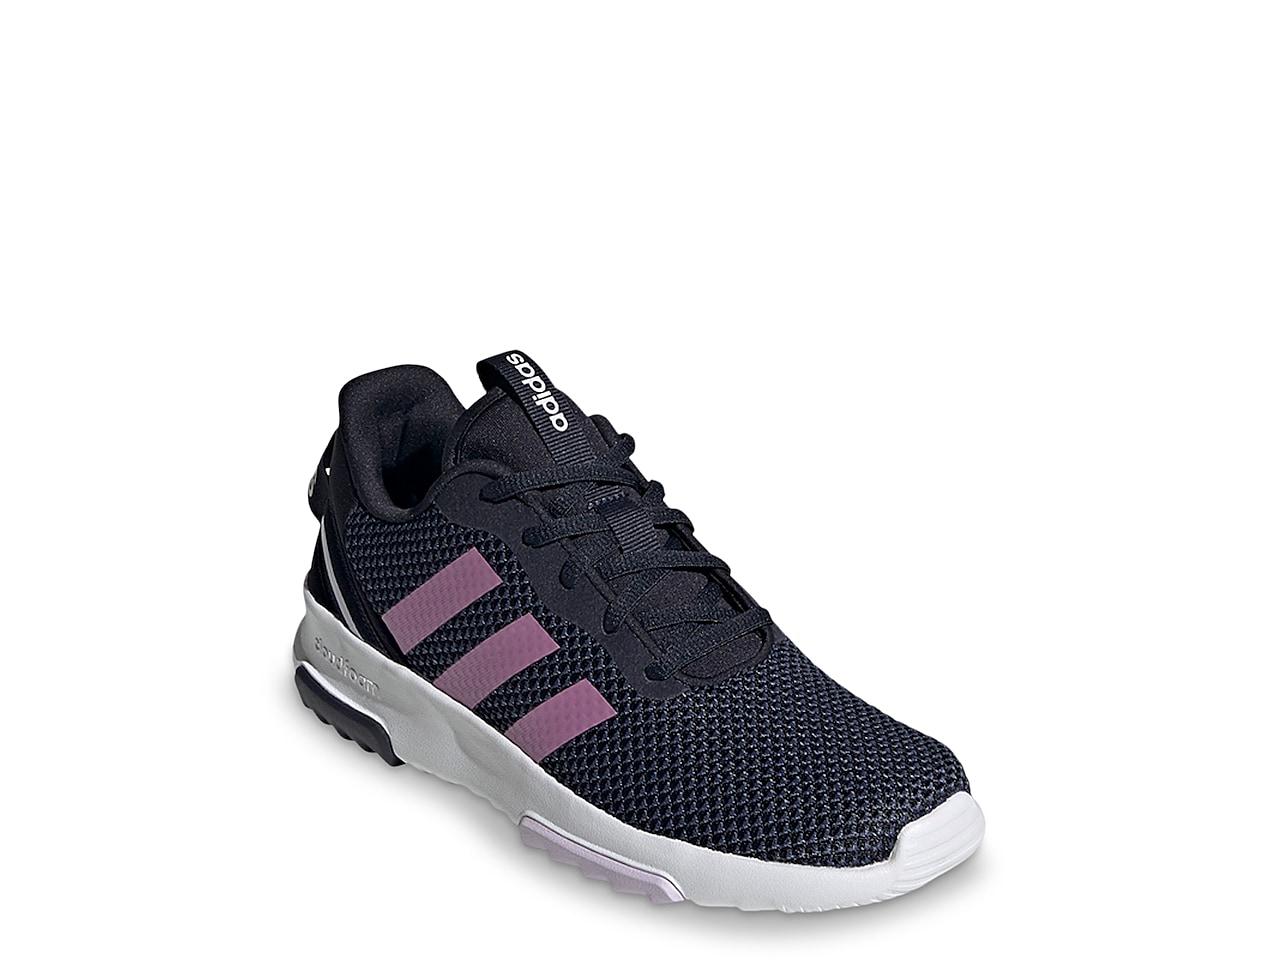 reparar dormir Mendicidad  adidas Racer TR 2.0 Sneaker - Kids' Kids Shoes | DSW